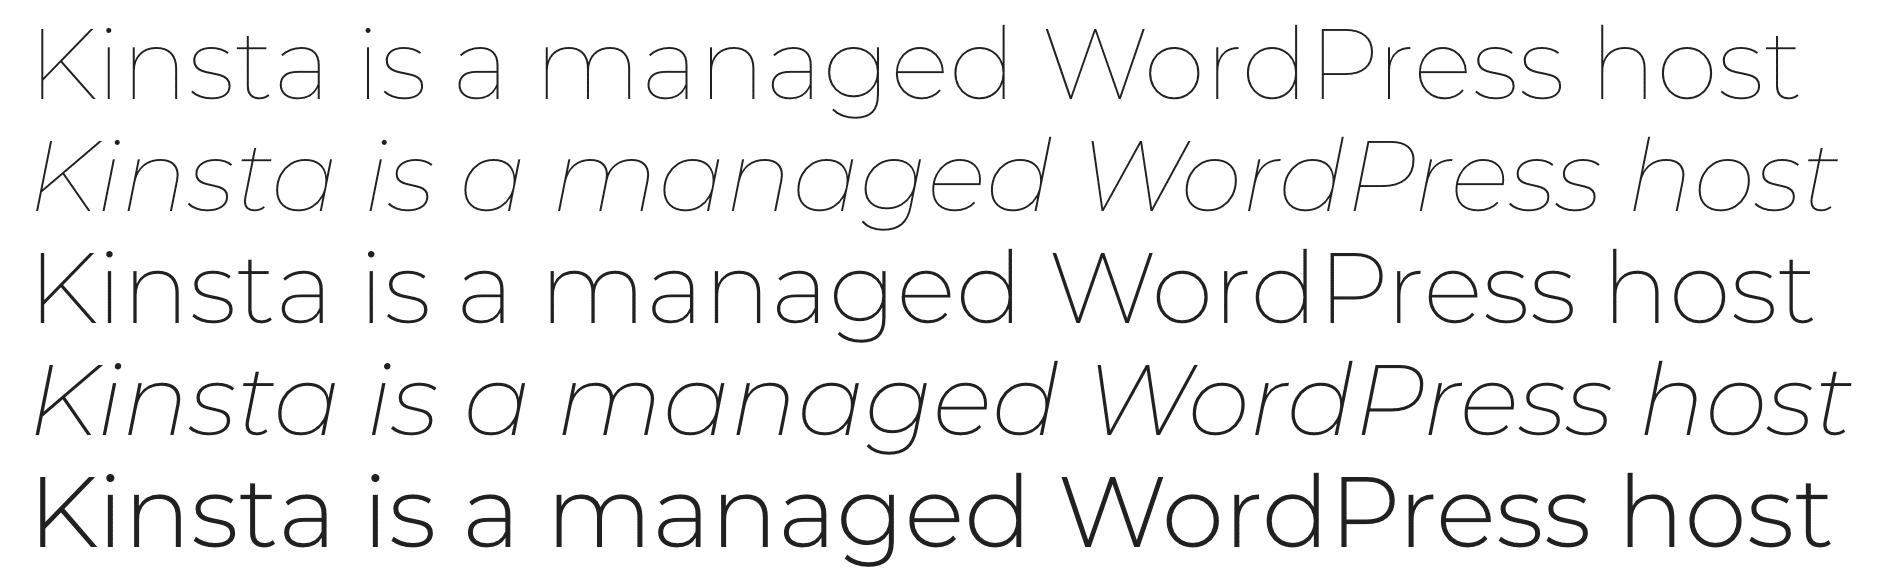 Montserrat Google font